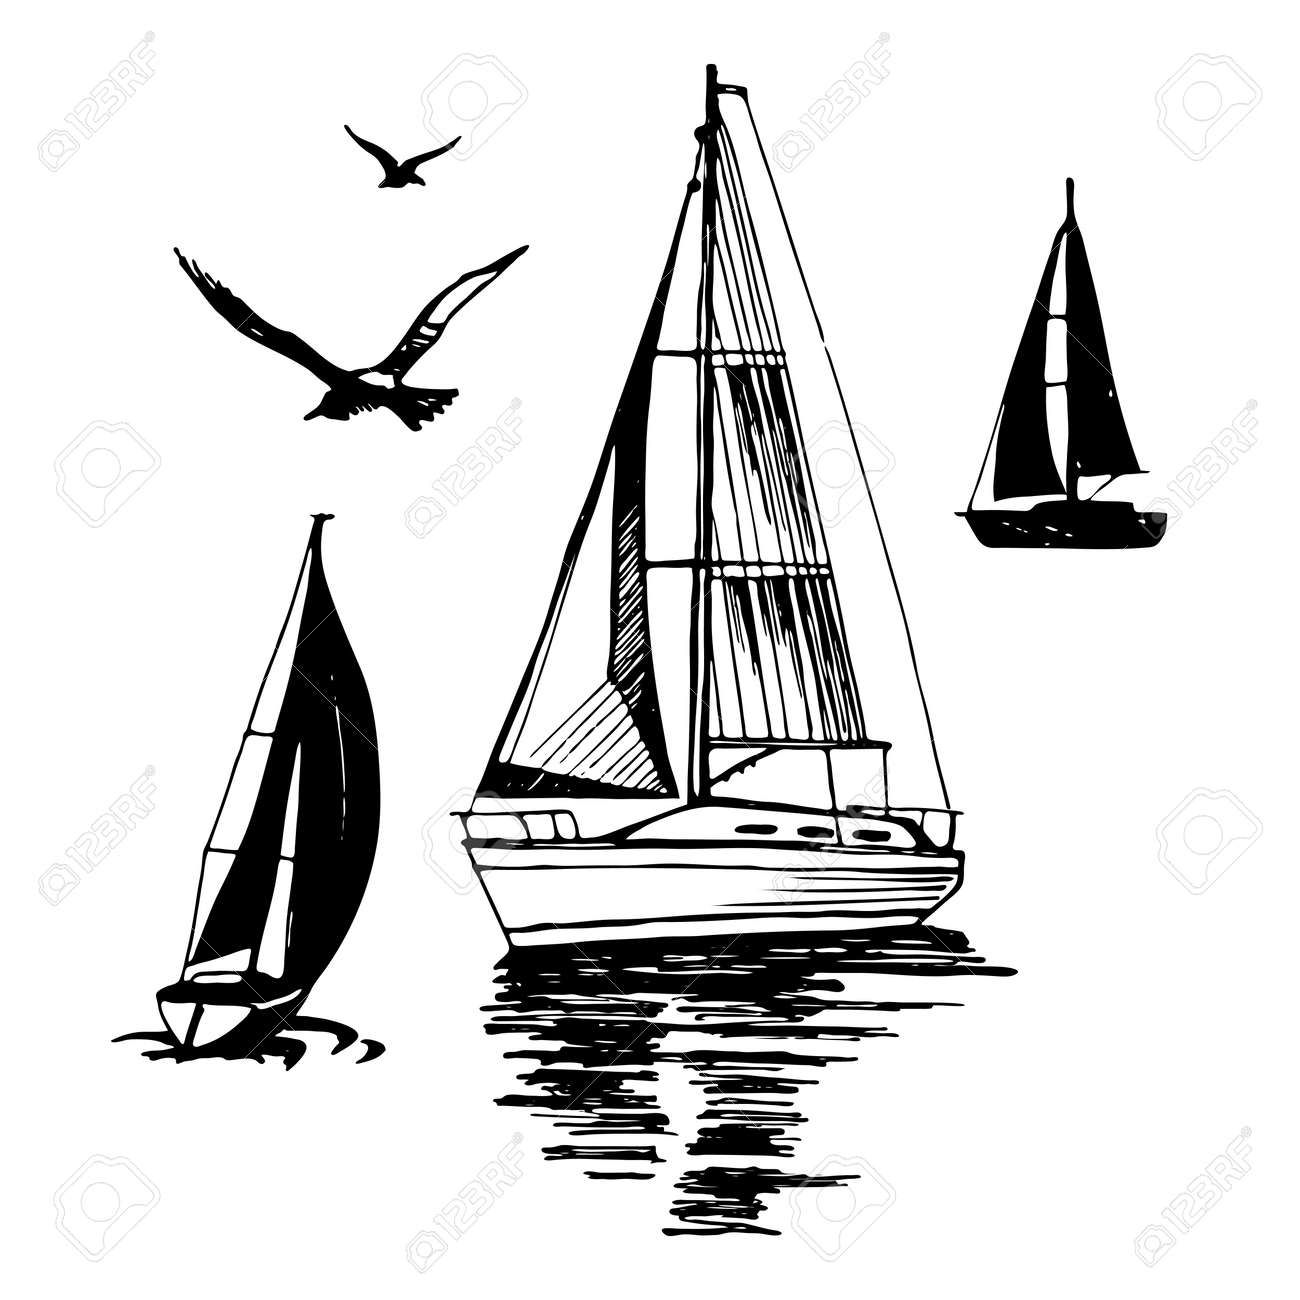 Sea yachts. Flying seagulls. - 86805203